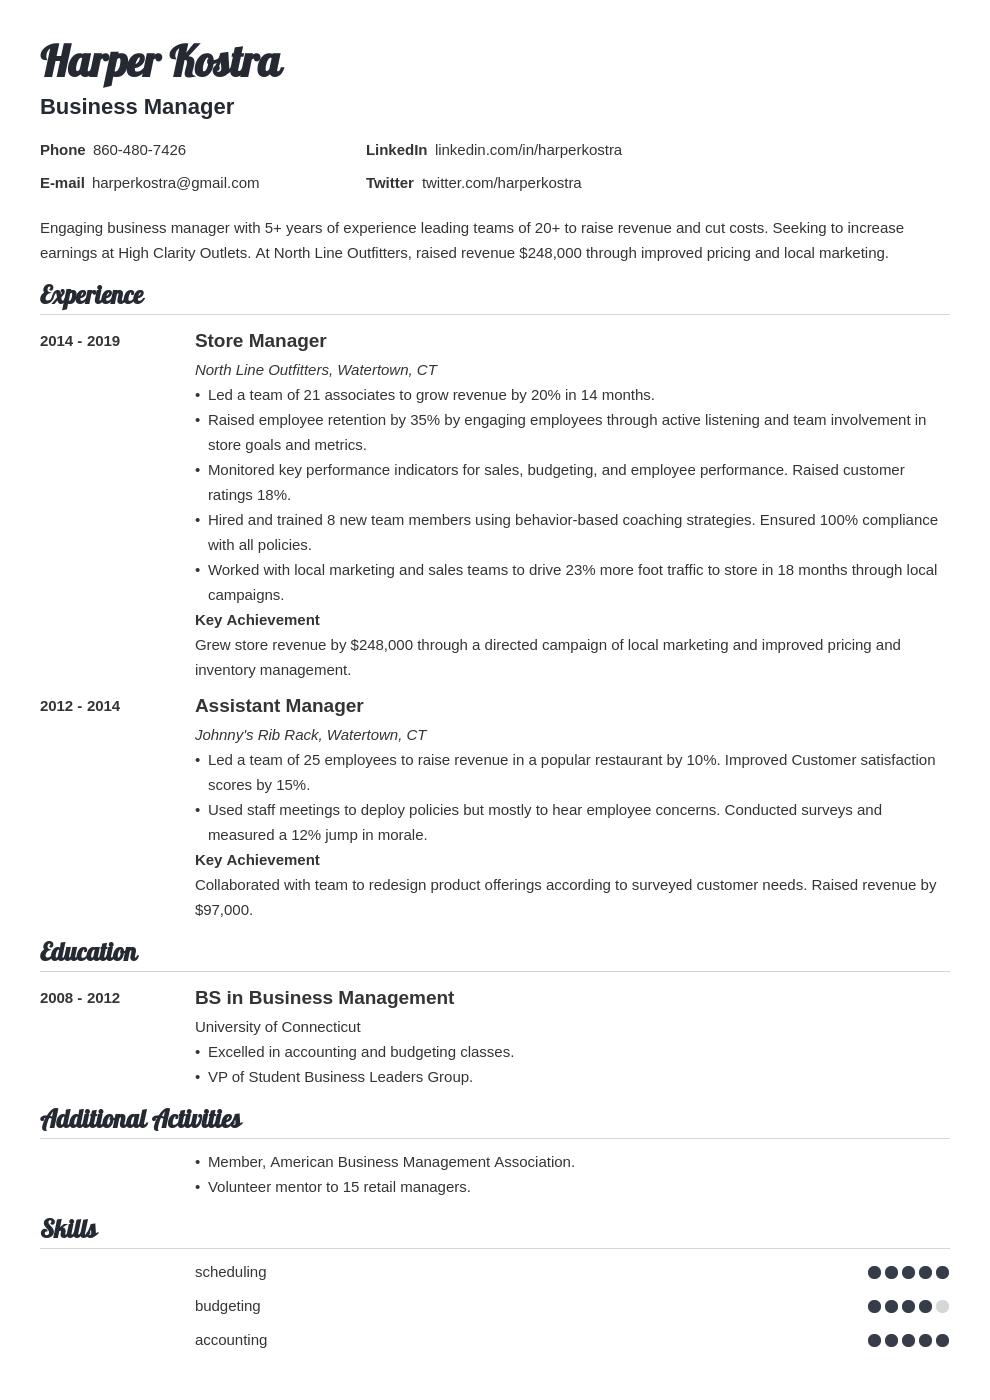 business manager template valera uk